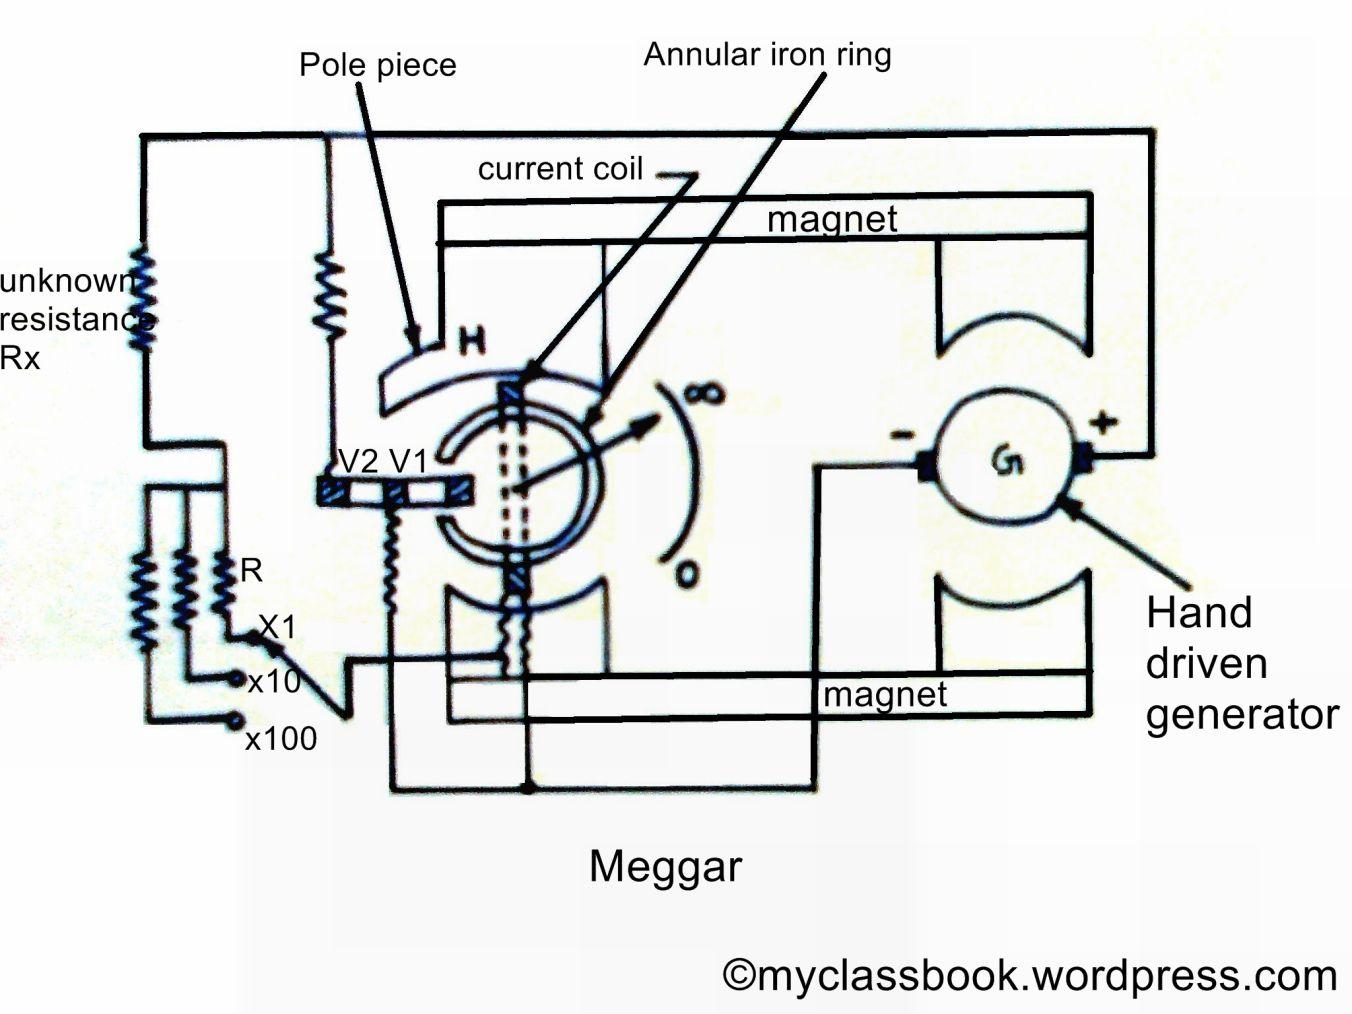 Construction And Working Principle Of Megger For Measurement Of High Resistances Myclassbook Principles Measurements Resistance